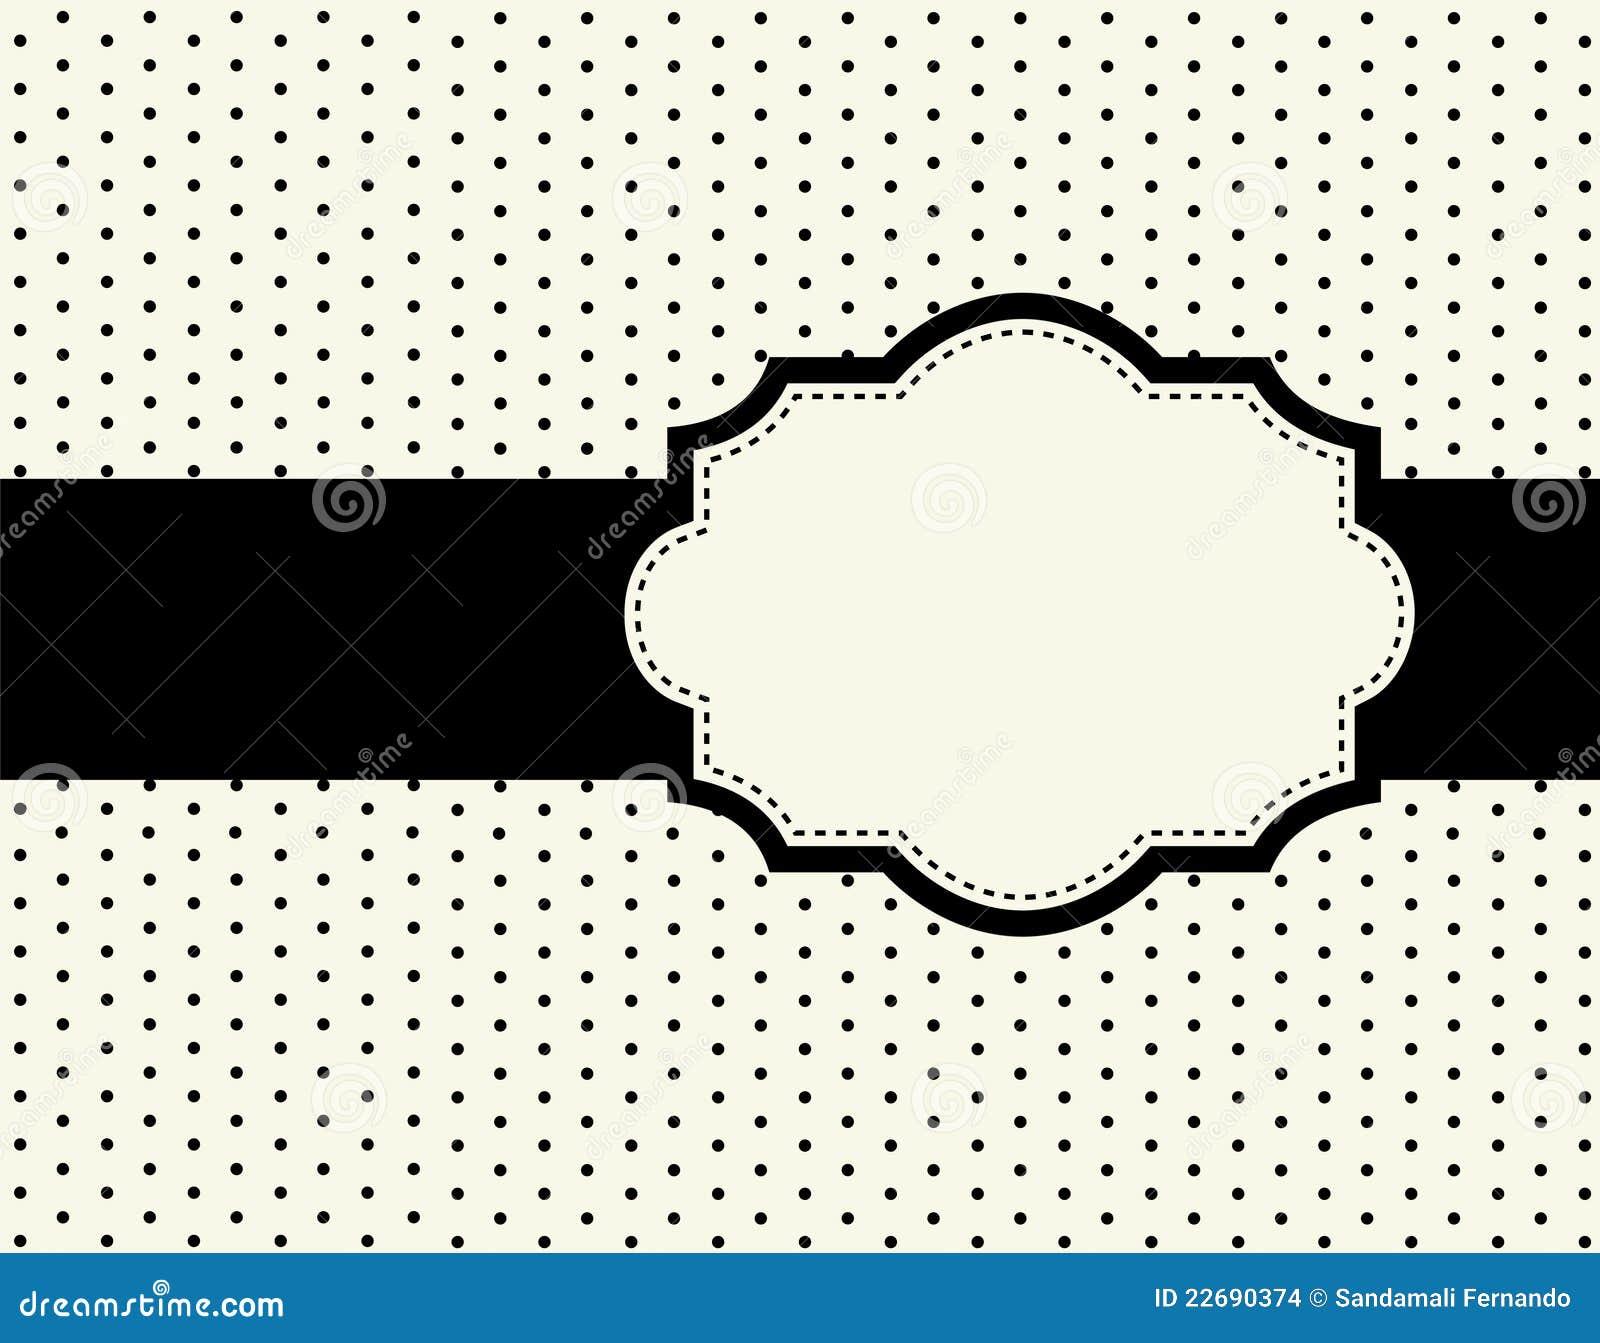 Cute polka dots frames / border s with black ribbons doodle frame ...